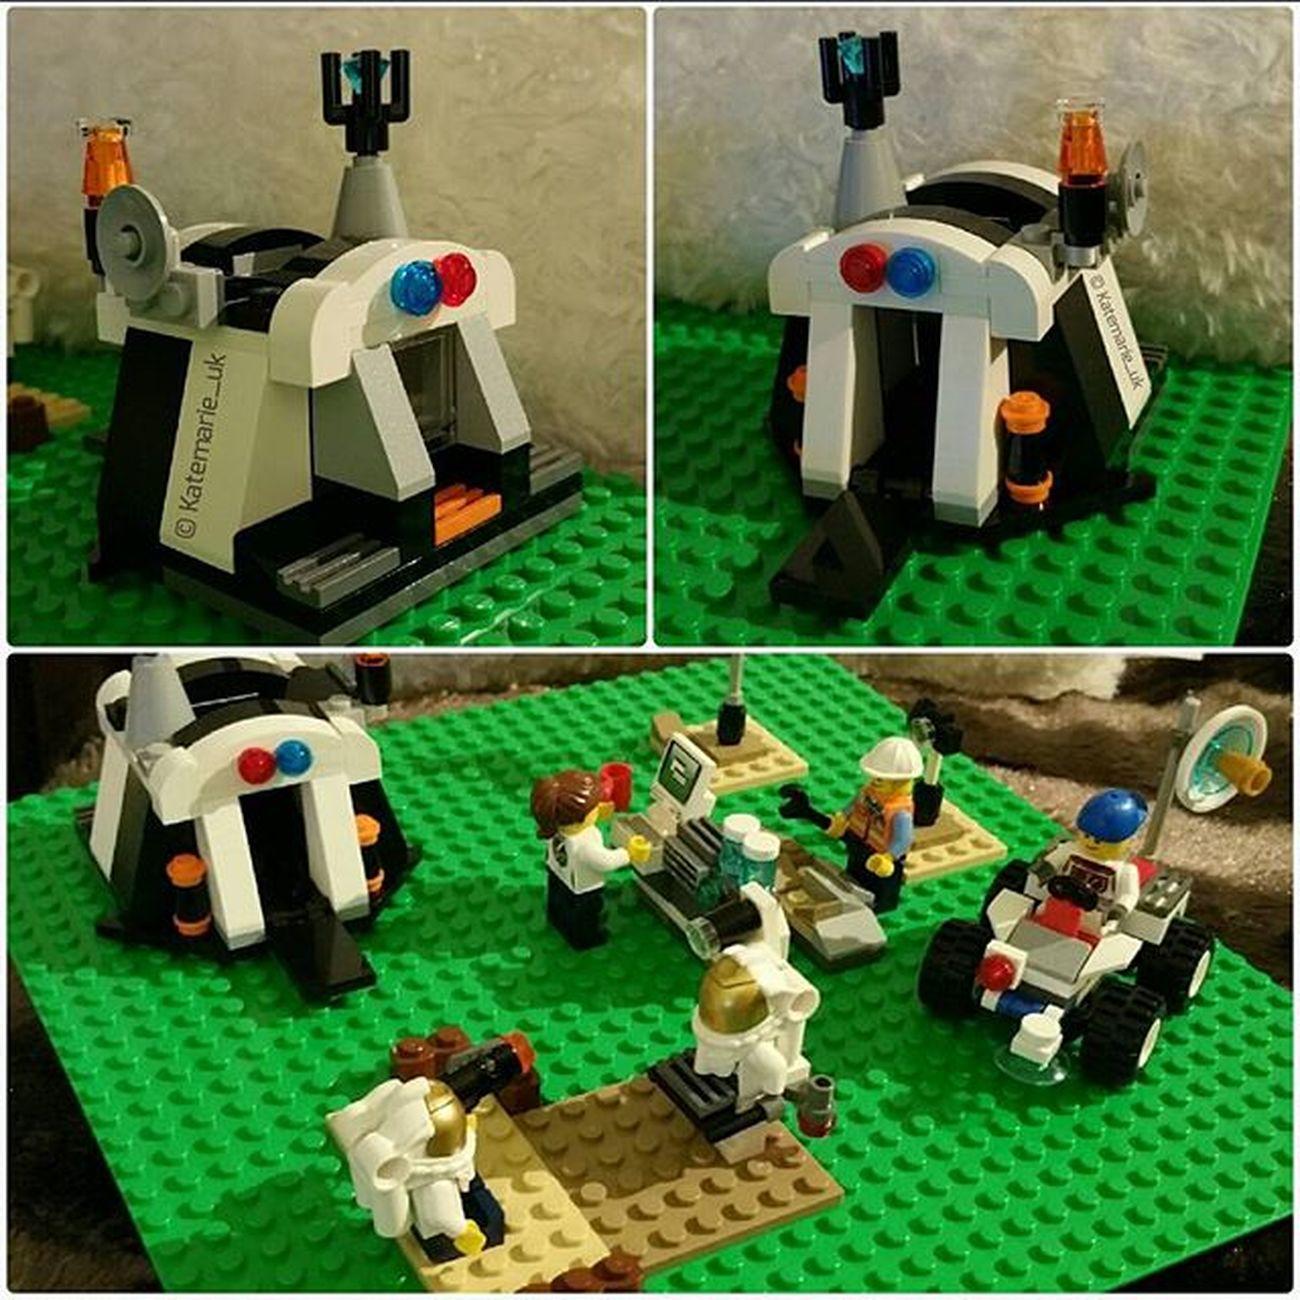 Top two pics are Moc LEGO Legomoc Afol Legolove LegoLover Legospaceman Legospace Legospacehut Legocity Legofan Myowncreation  Legogirl I do need a better colour baseplate though!